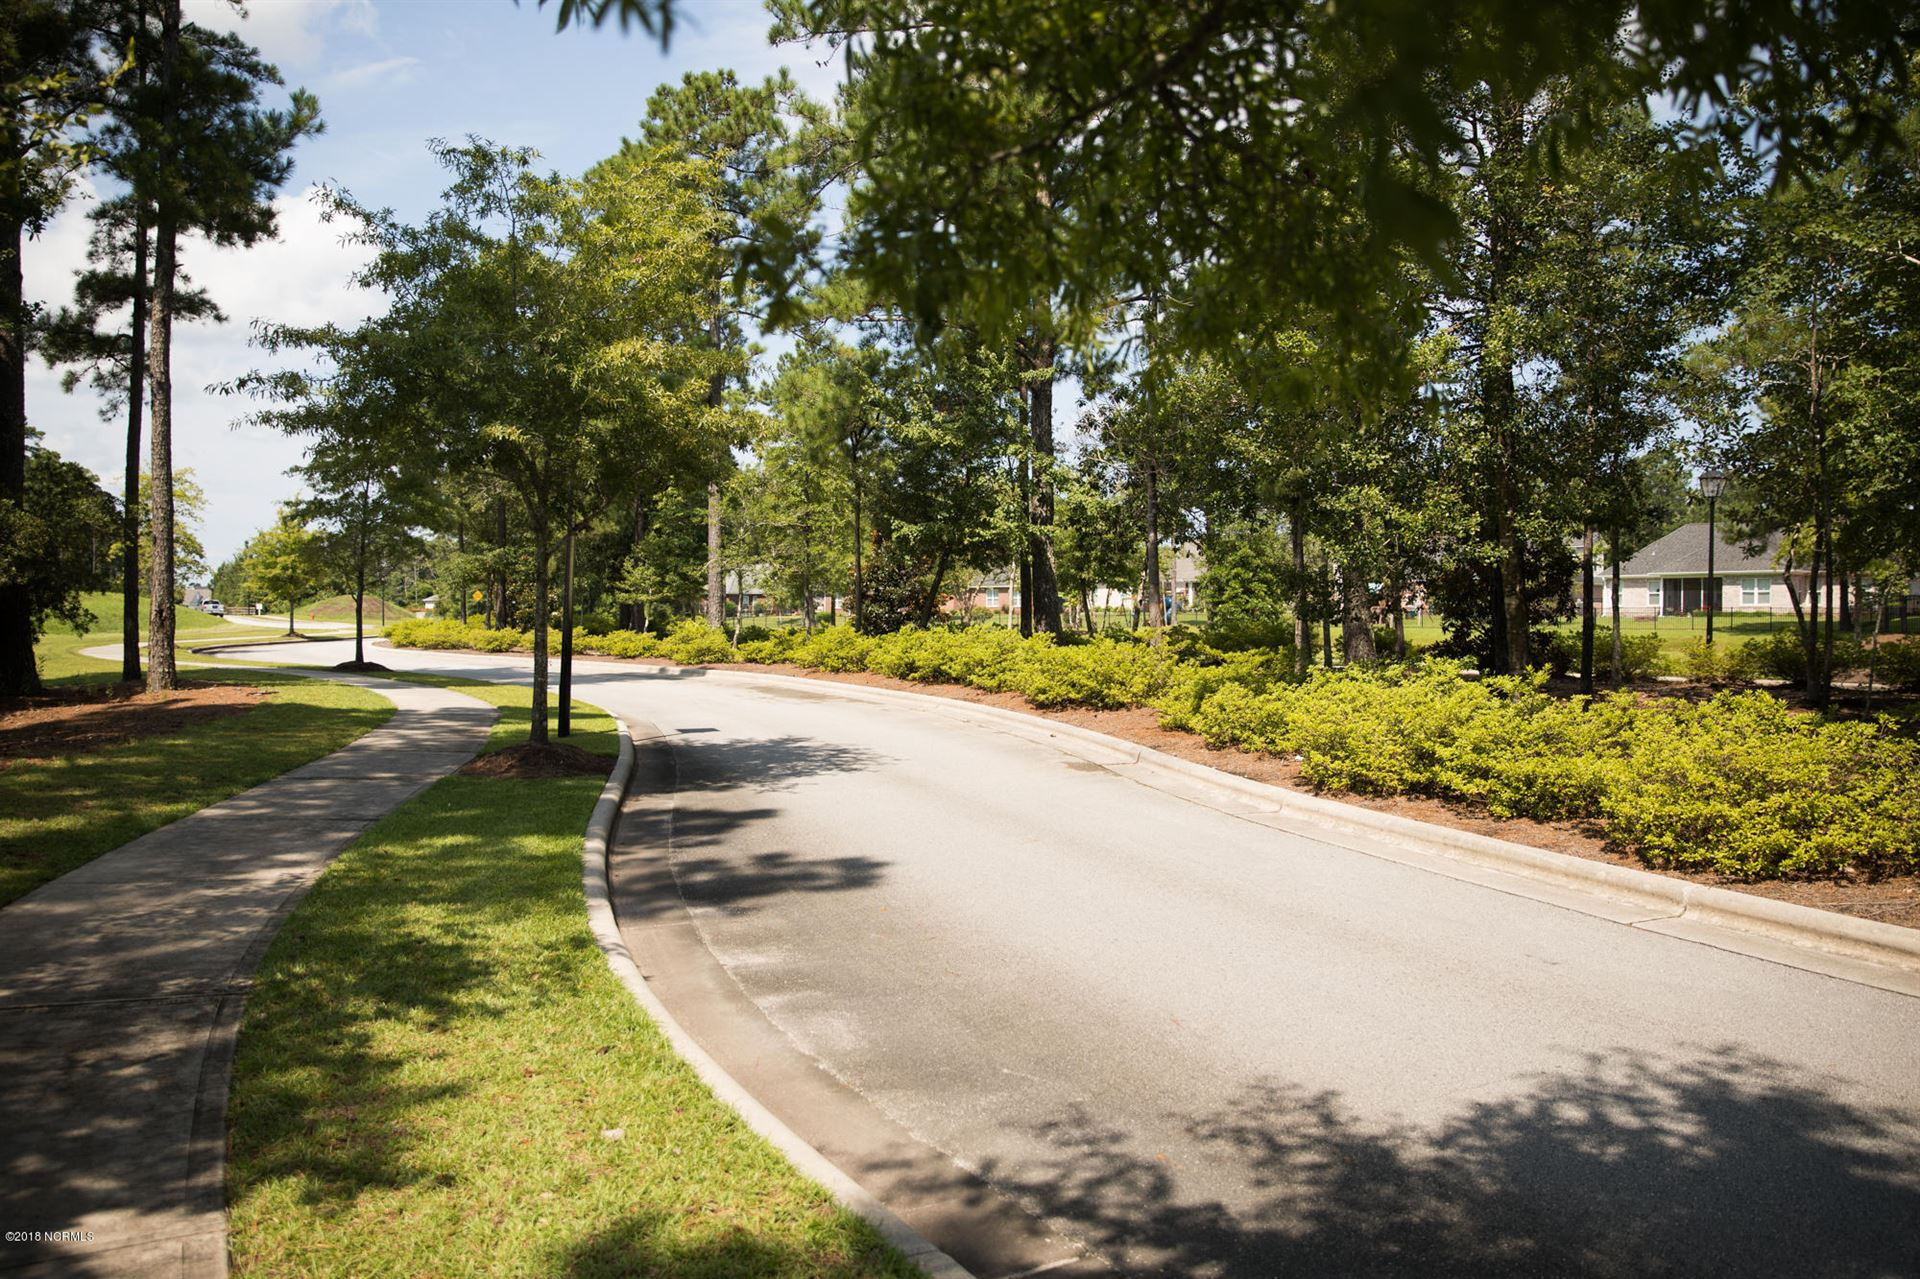 Photo of 2581 Longleaf Pine Circle, Leland, NC 28451 (MLS # 100281738)